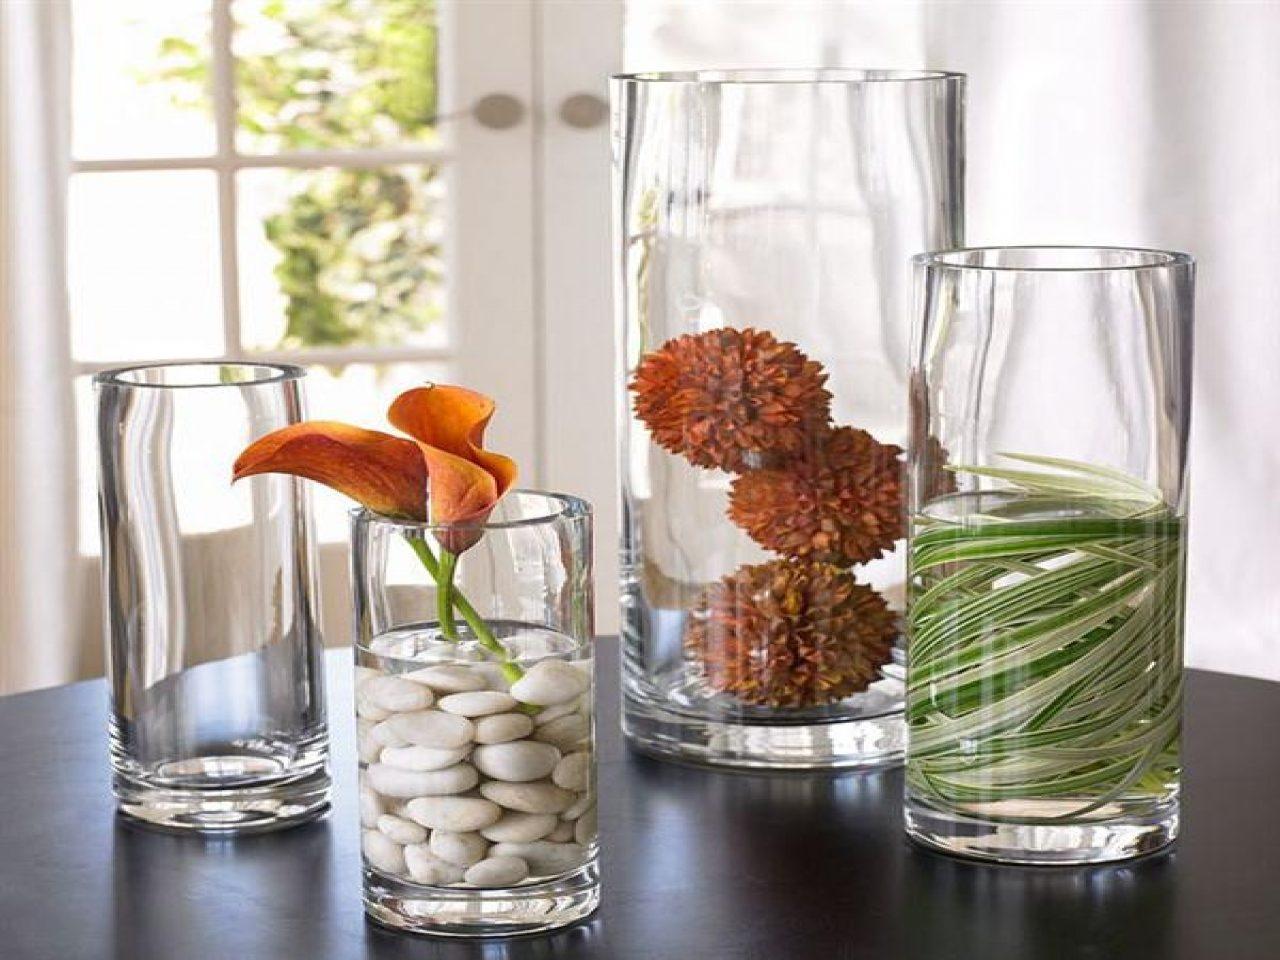 vase-table-centerpieces-decoration-ideas-decorating-ideas-with-glass-vases-66ace22707230959_1484730296-1495638